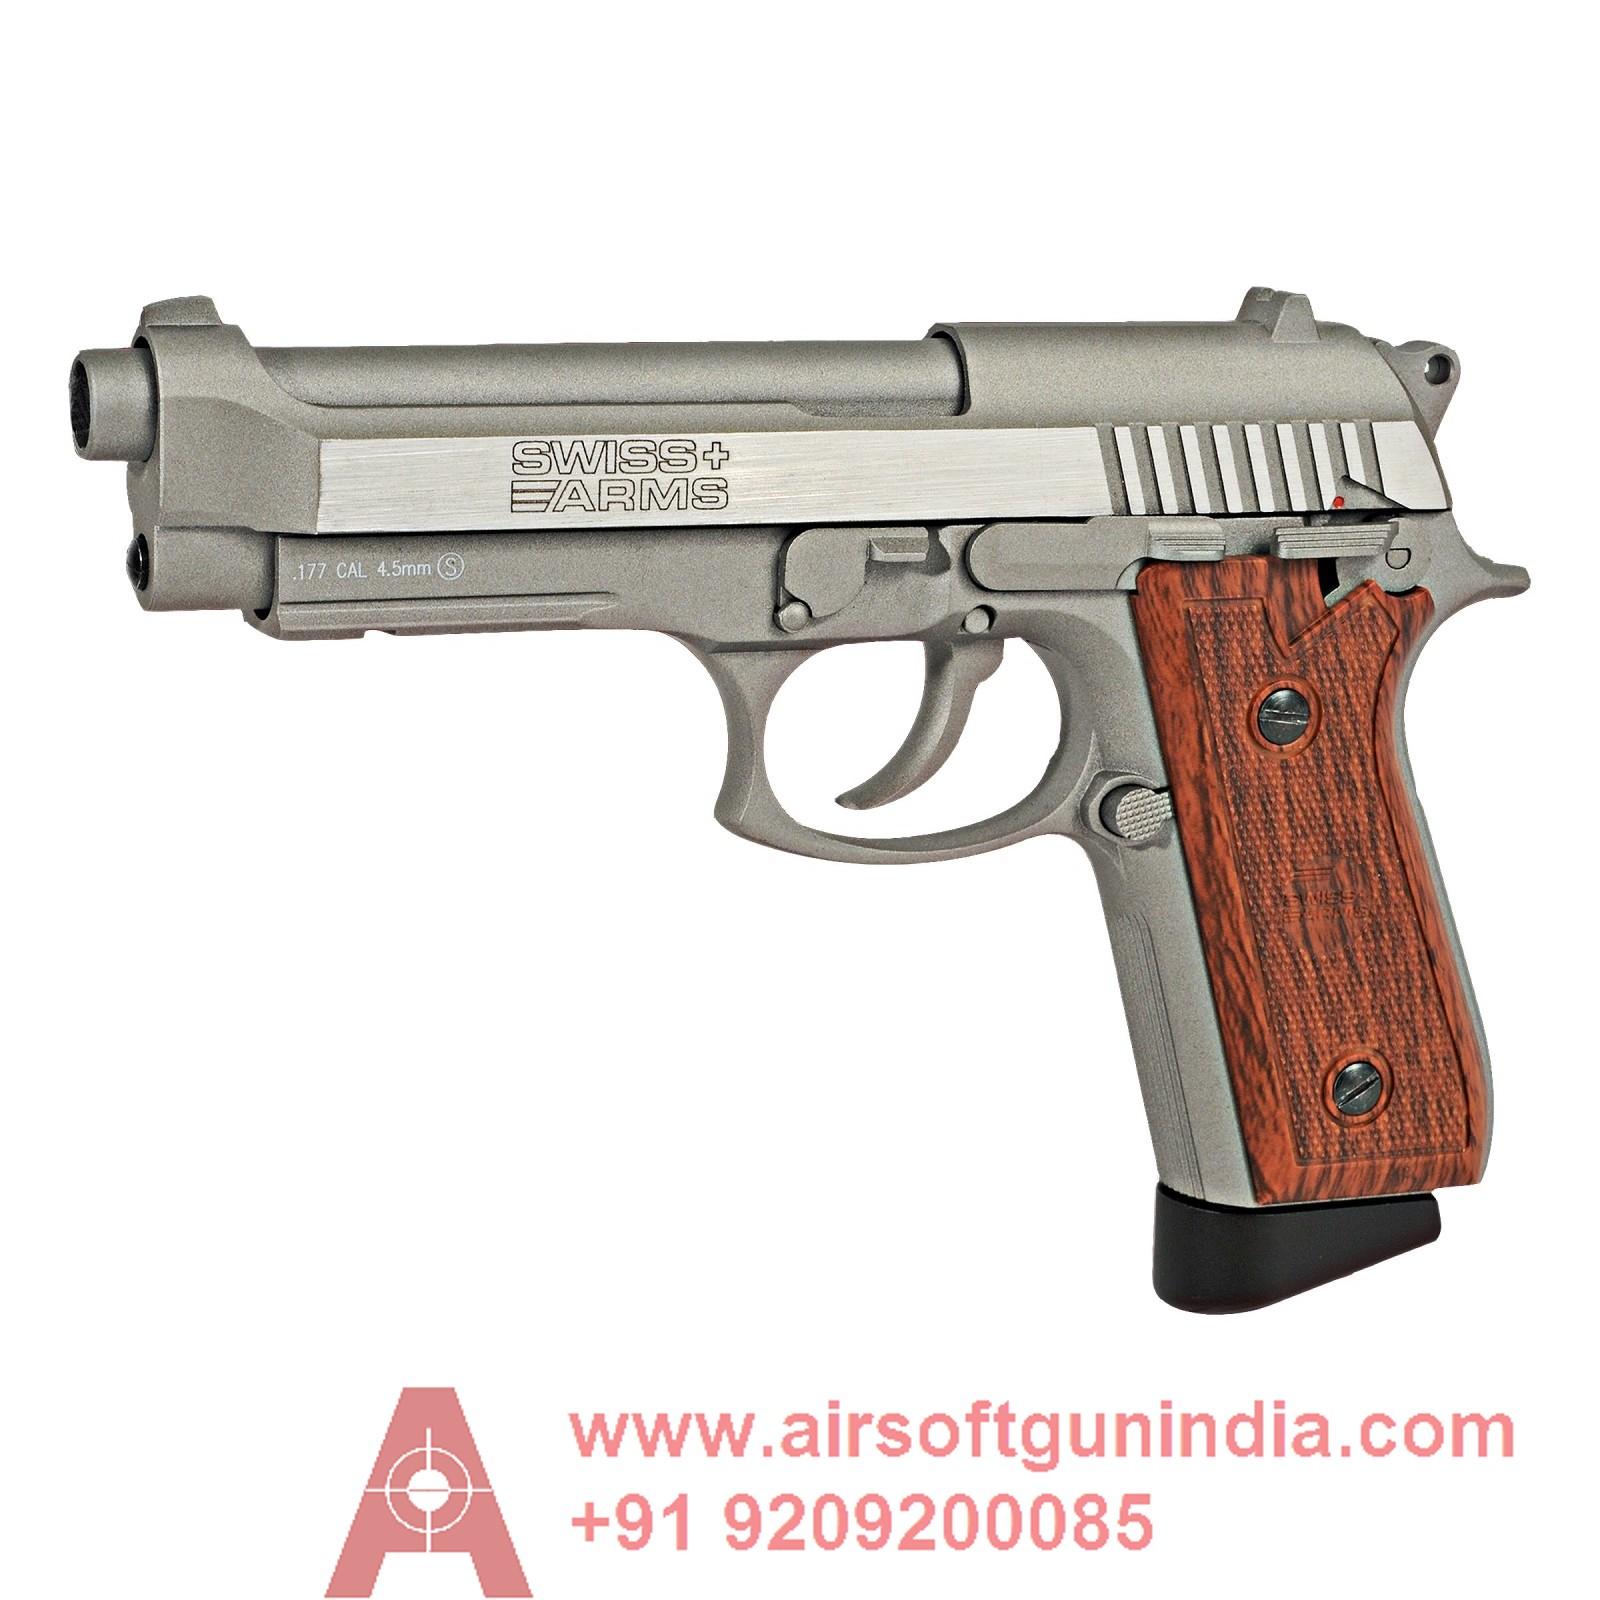 Beretta M9 Style Swiss Arms P92 CO2 Pistol Nickel